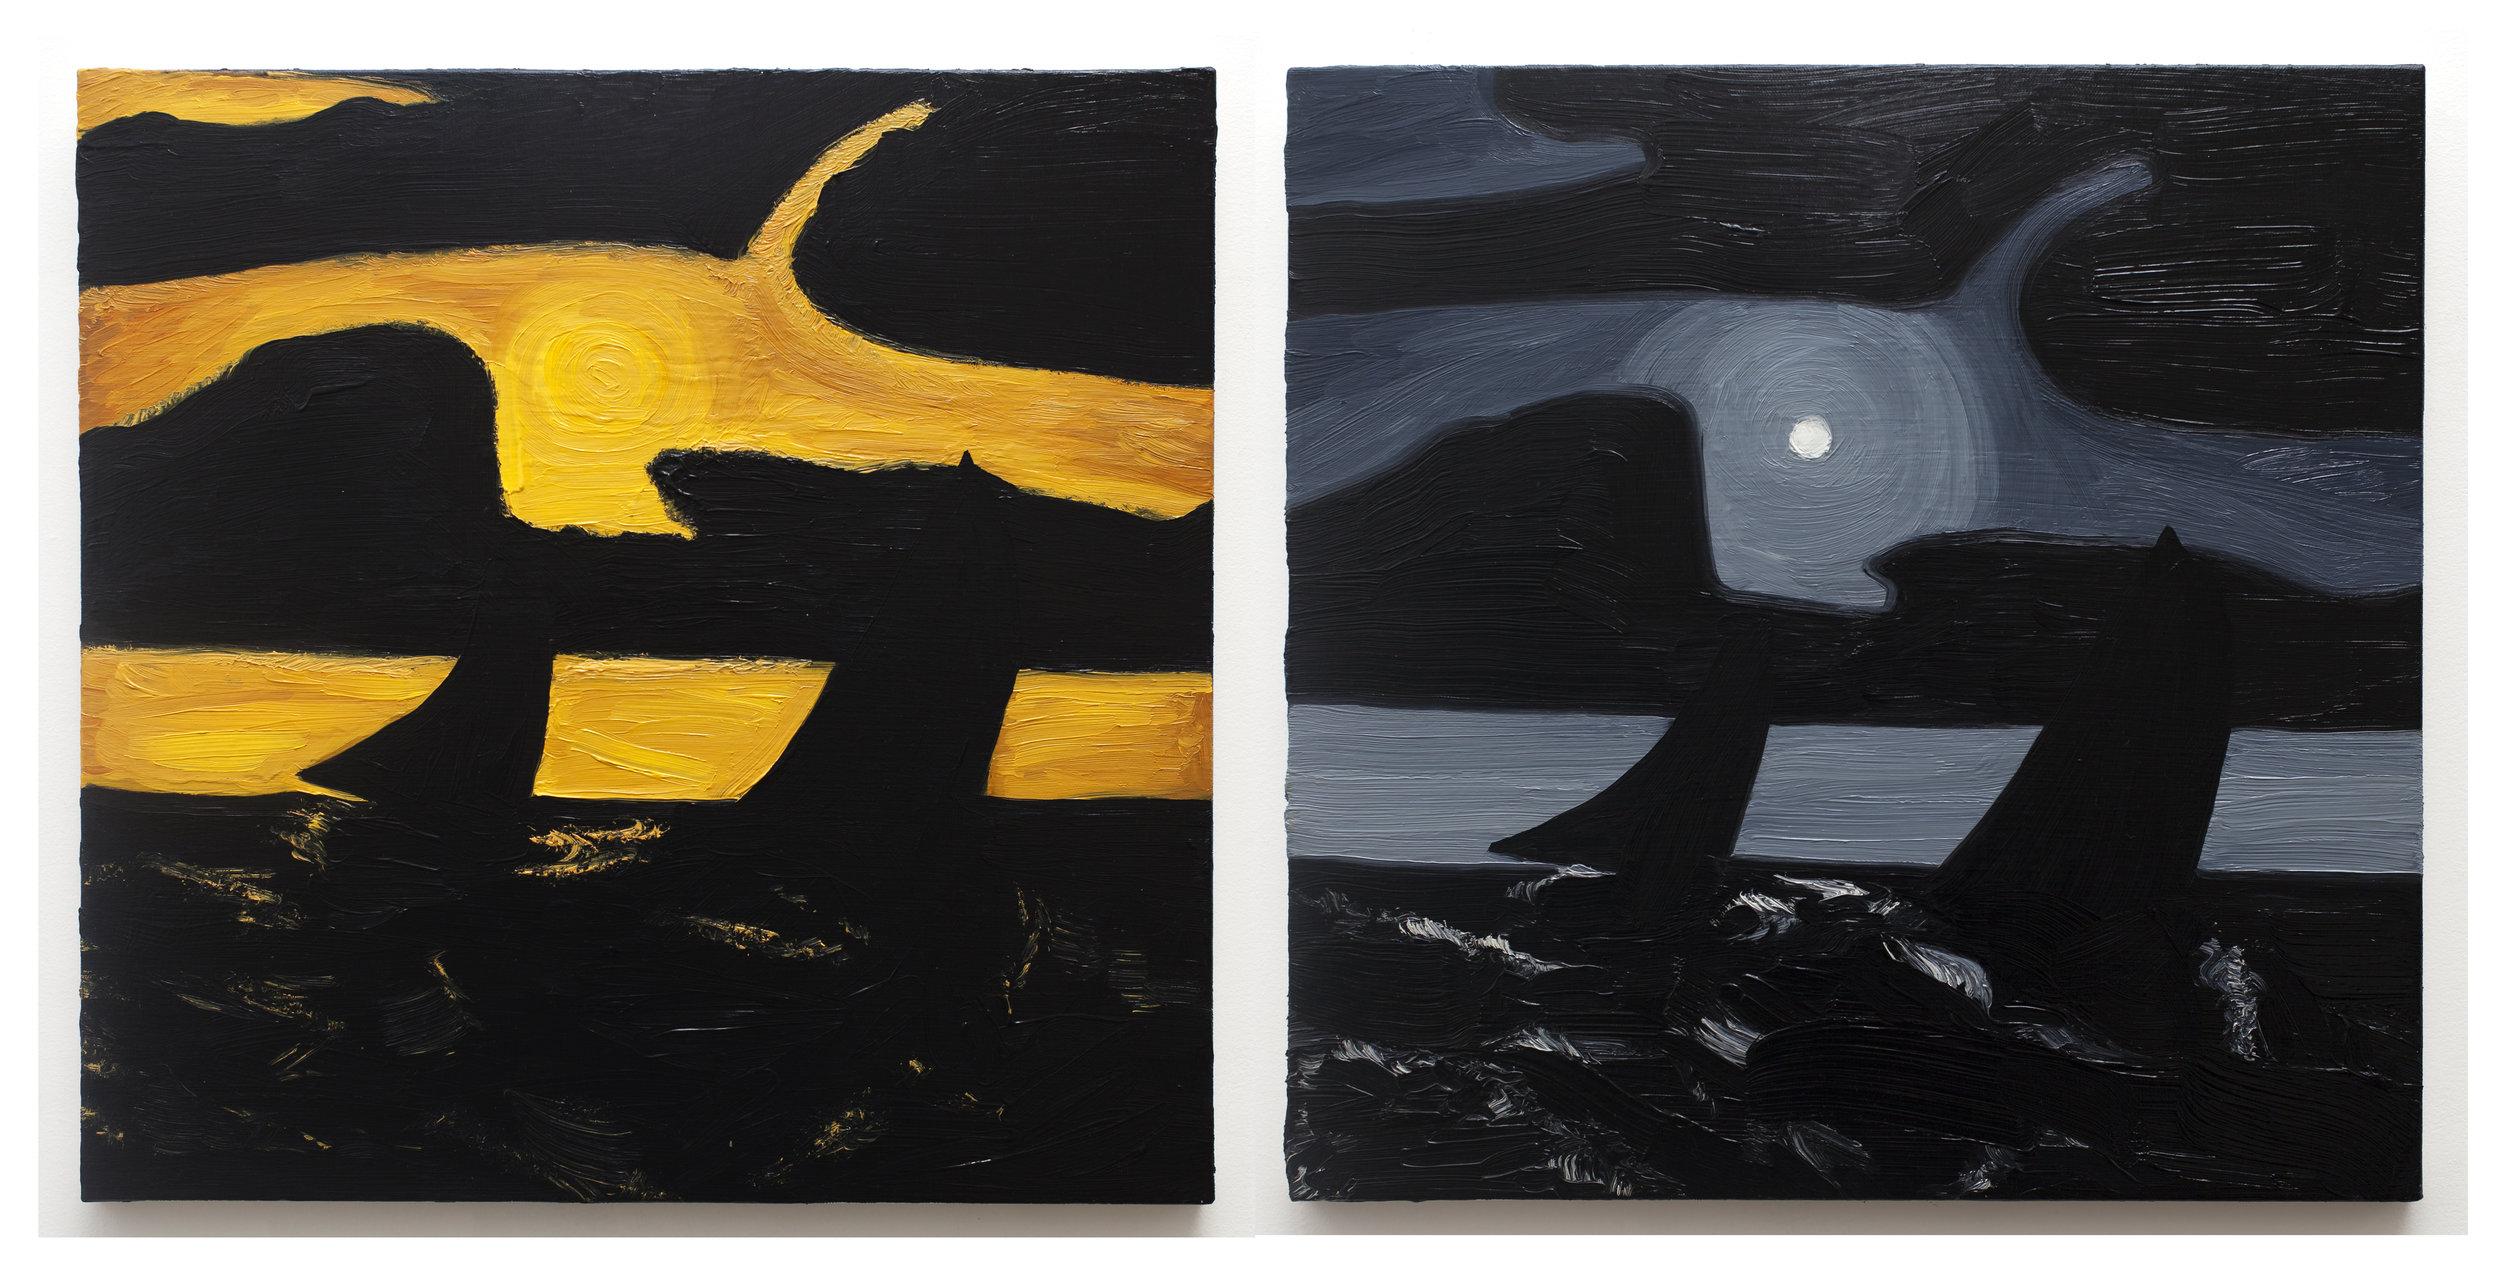 Moonlight Marine (Studies after Albert Pinkham Ryder)